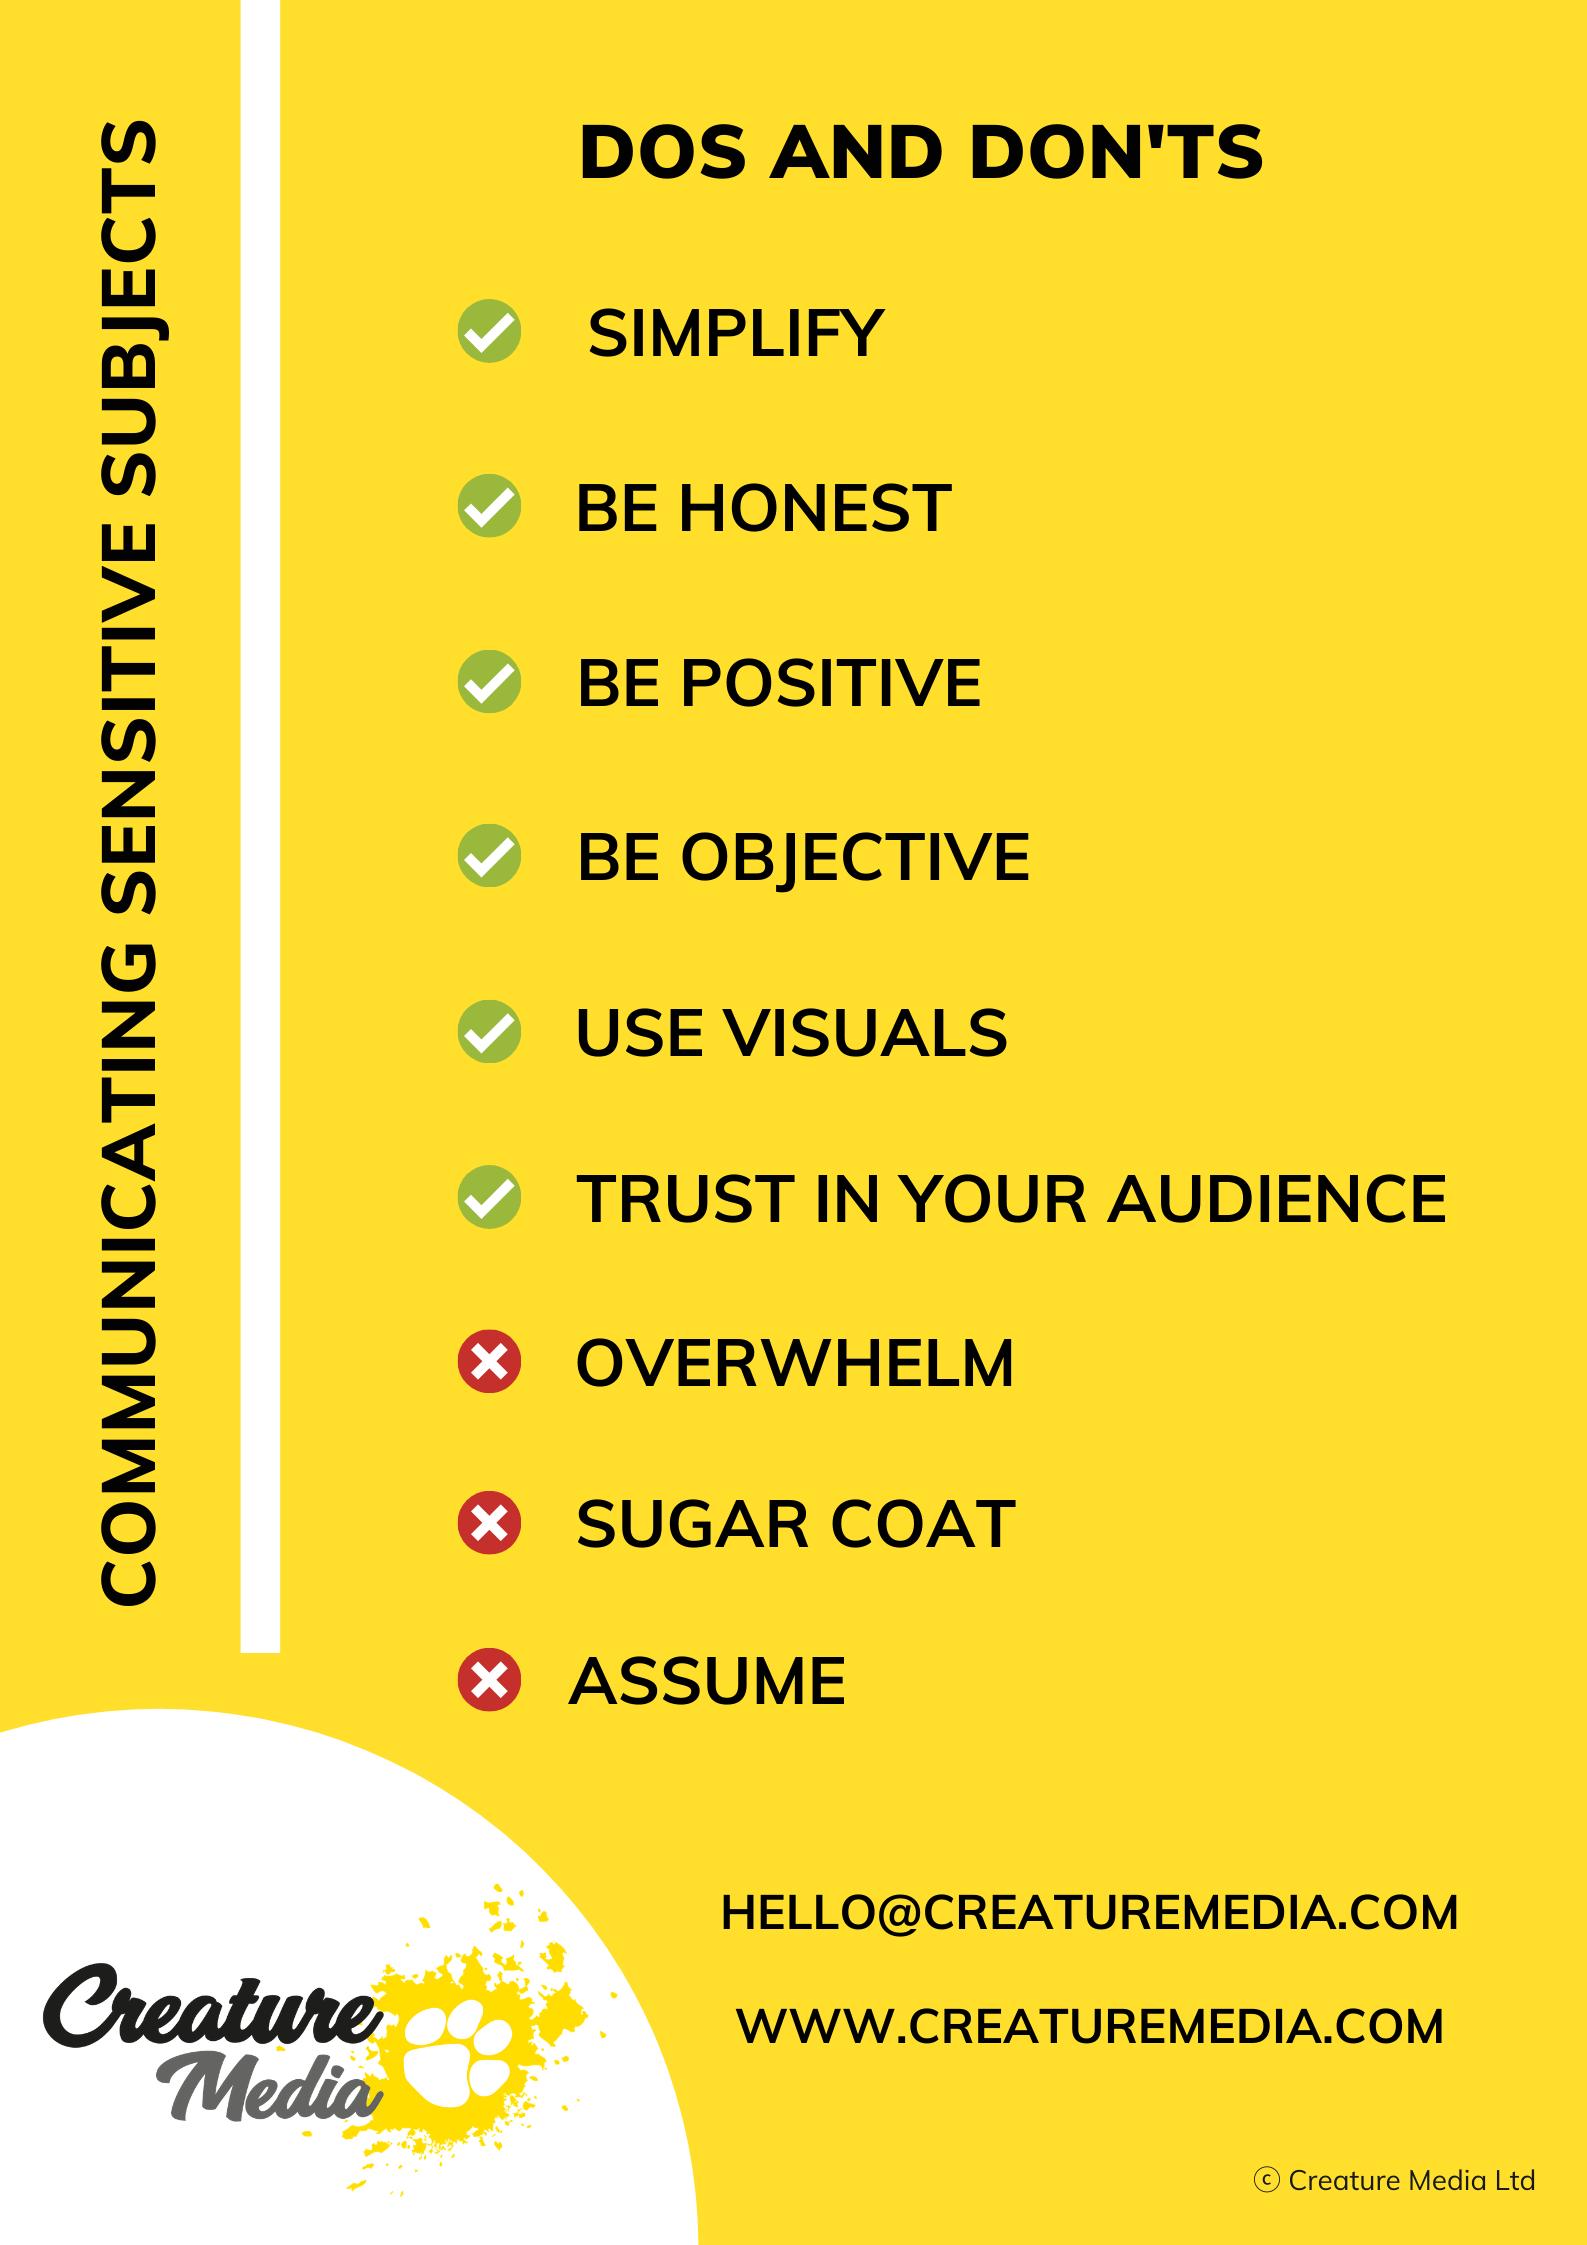 Creature Media webinar: How to Make Sensitive Topics Engaging